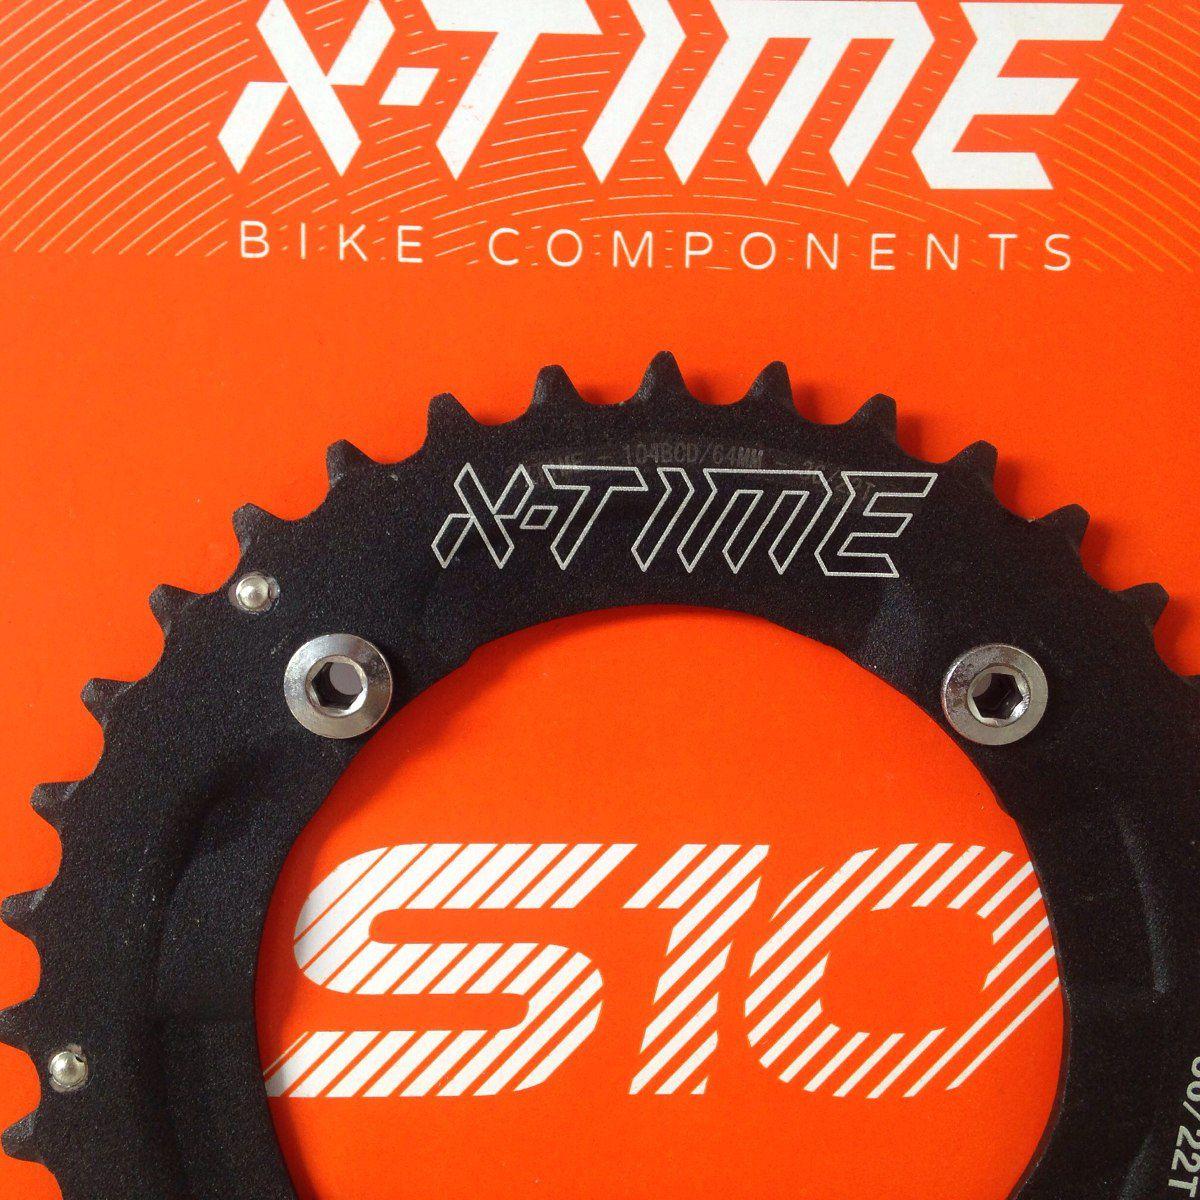 Coroa Tsw X-time 36 Dentes Bcd 104mm 2x10 Para Bike